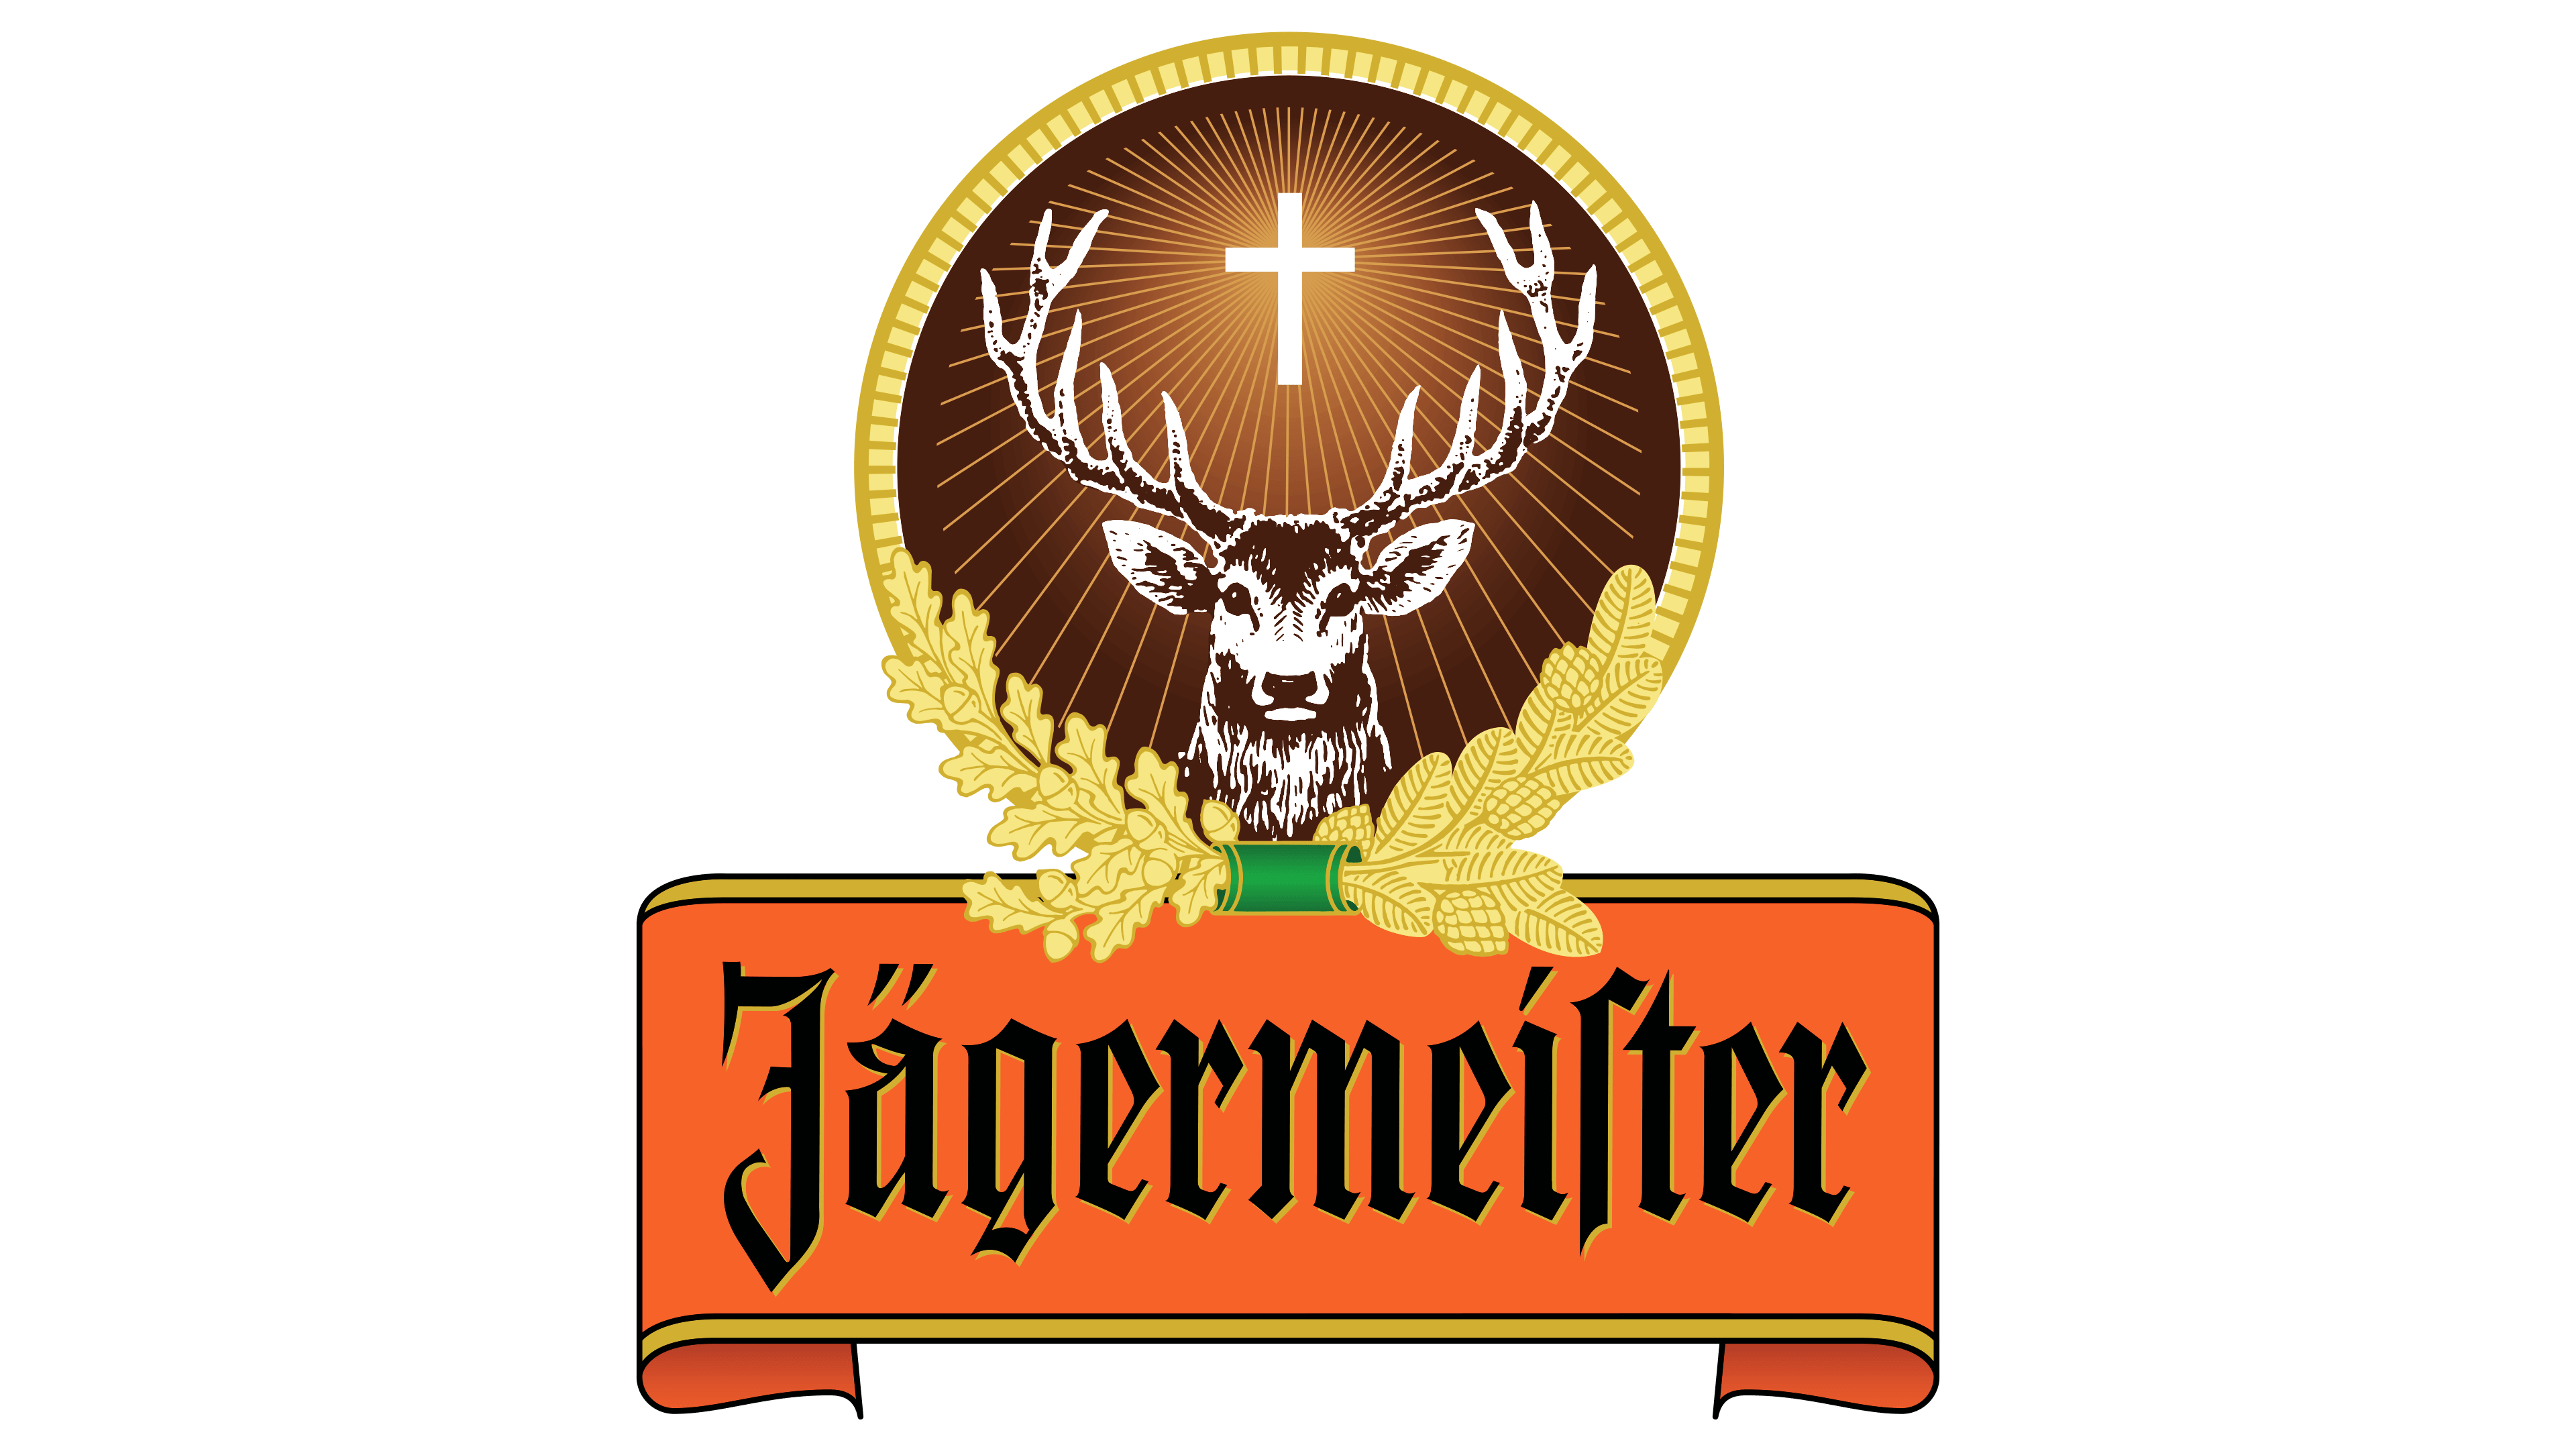 Jagermeister Symbol